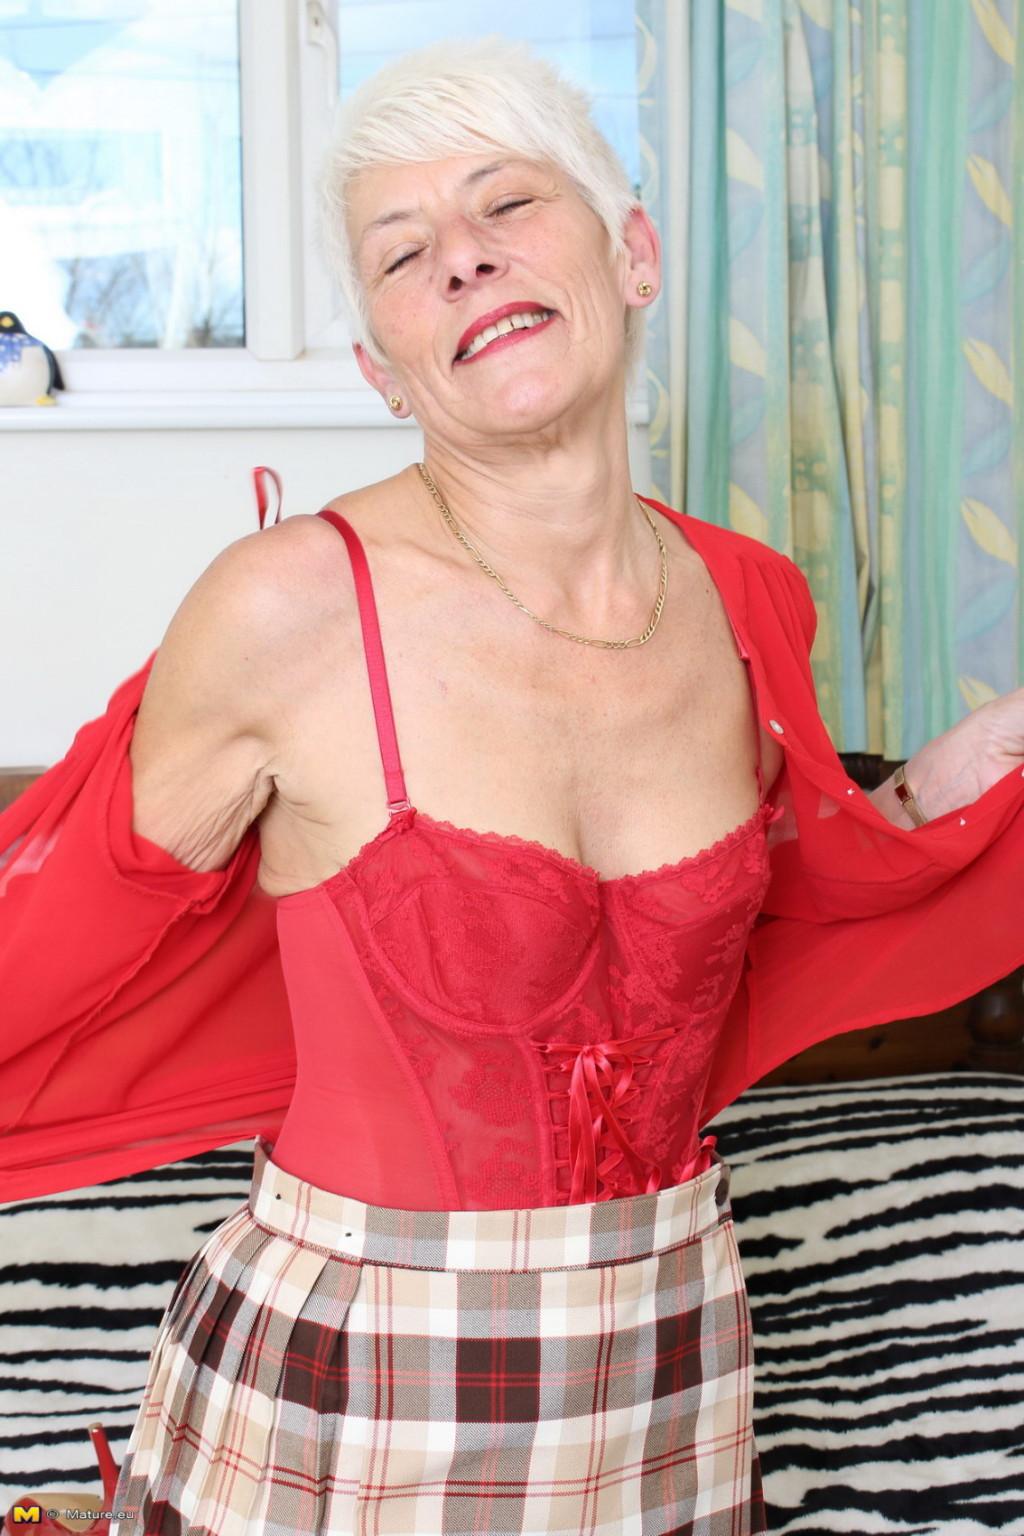 Онлайн порно видео бесплатно зрелых женщин и бабушек